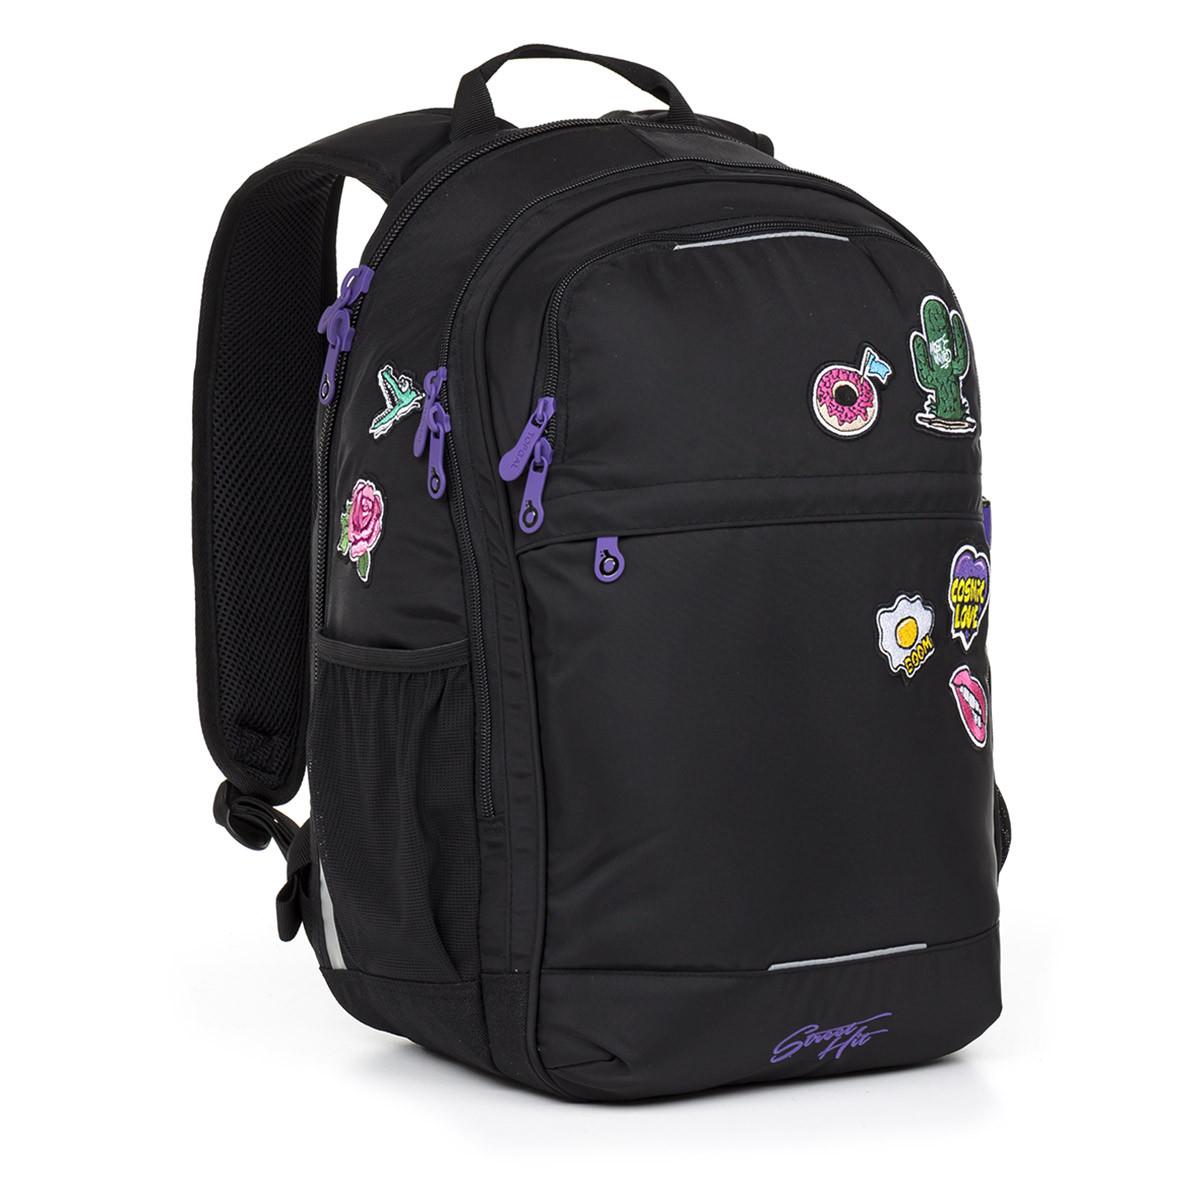 0f0194e5697 Studentský batoh Topgal - RUBI17007 G